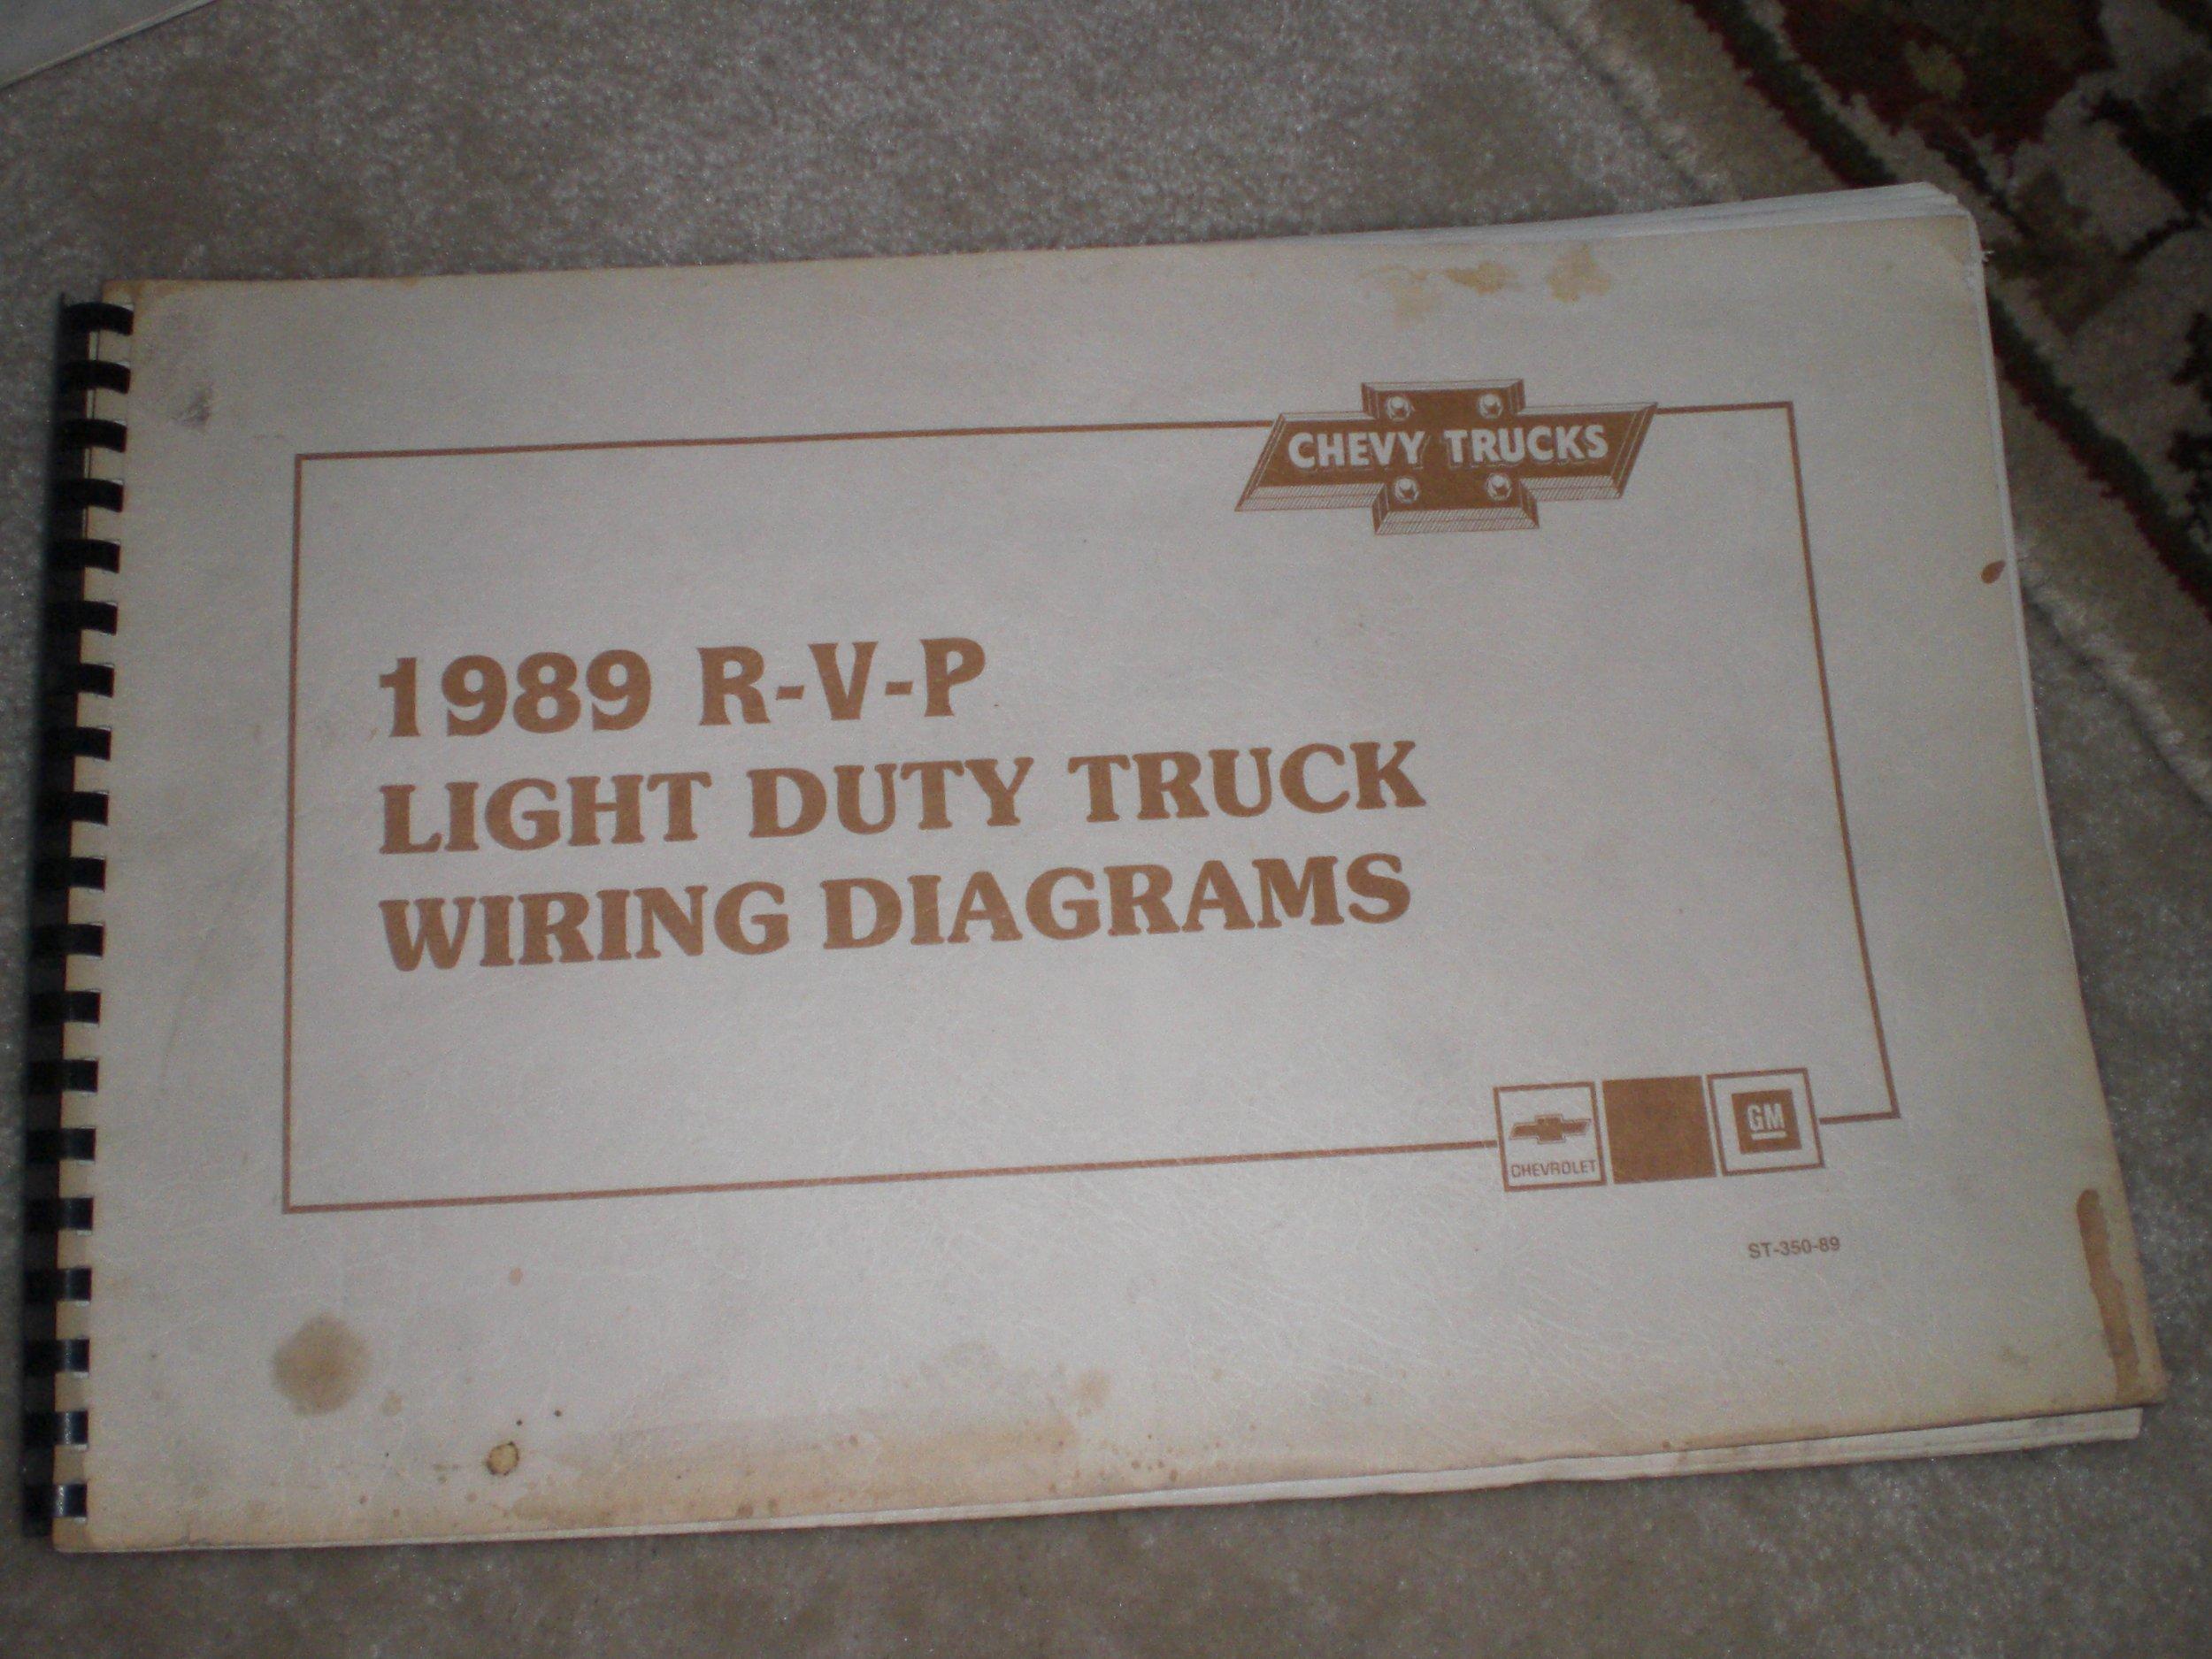 1989 ford r v p light duty truck wiring diagrams general motors co rh amazon com Outdoor Lighting Wiring Diagram Outdoor Lighting Wiring Diagram